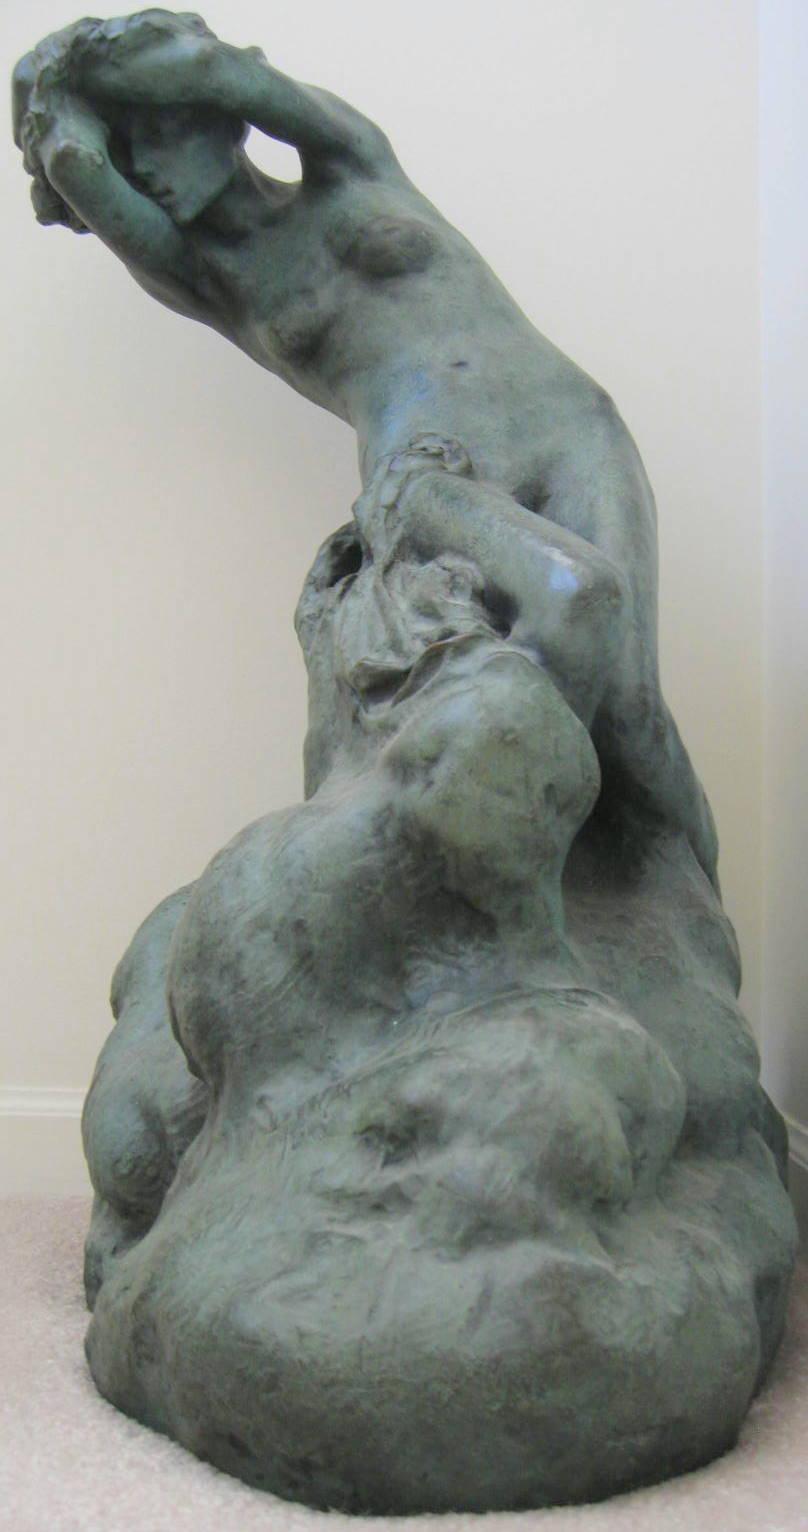 Alfonso Iannelli | 1888 - 1965